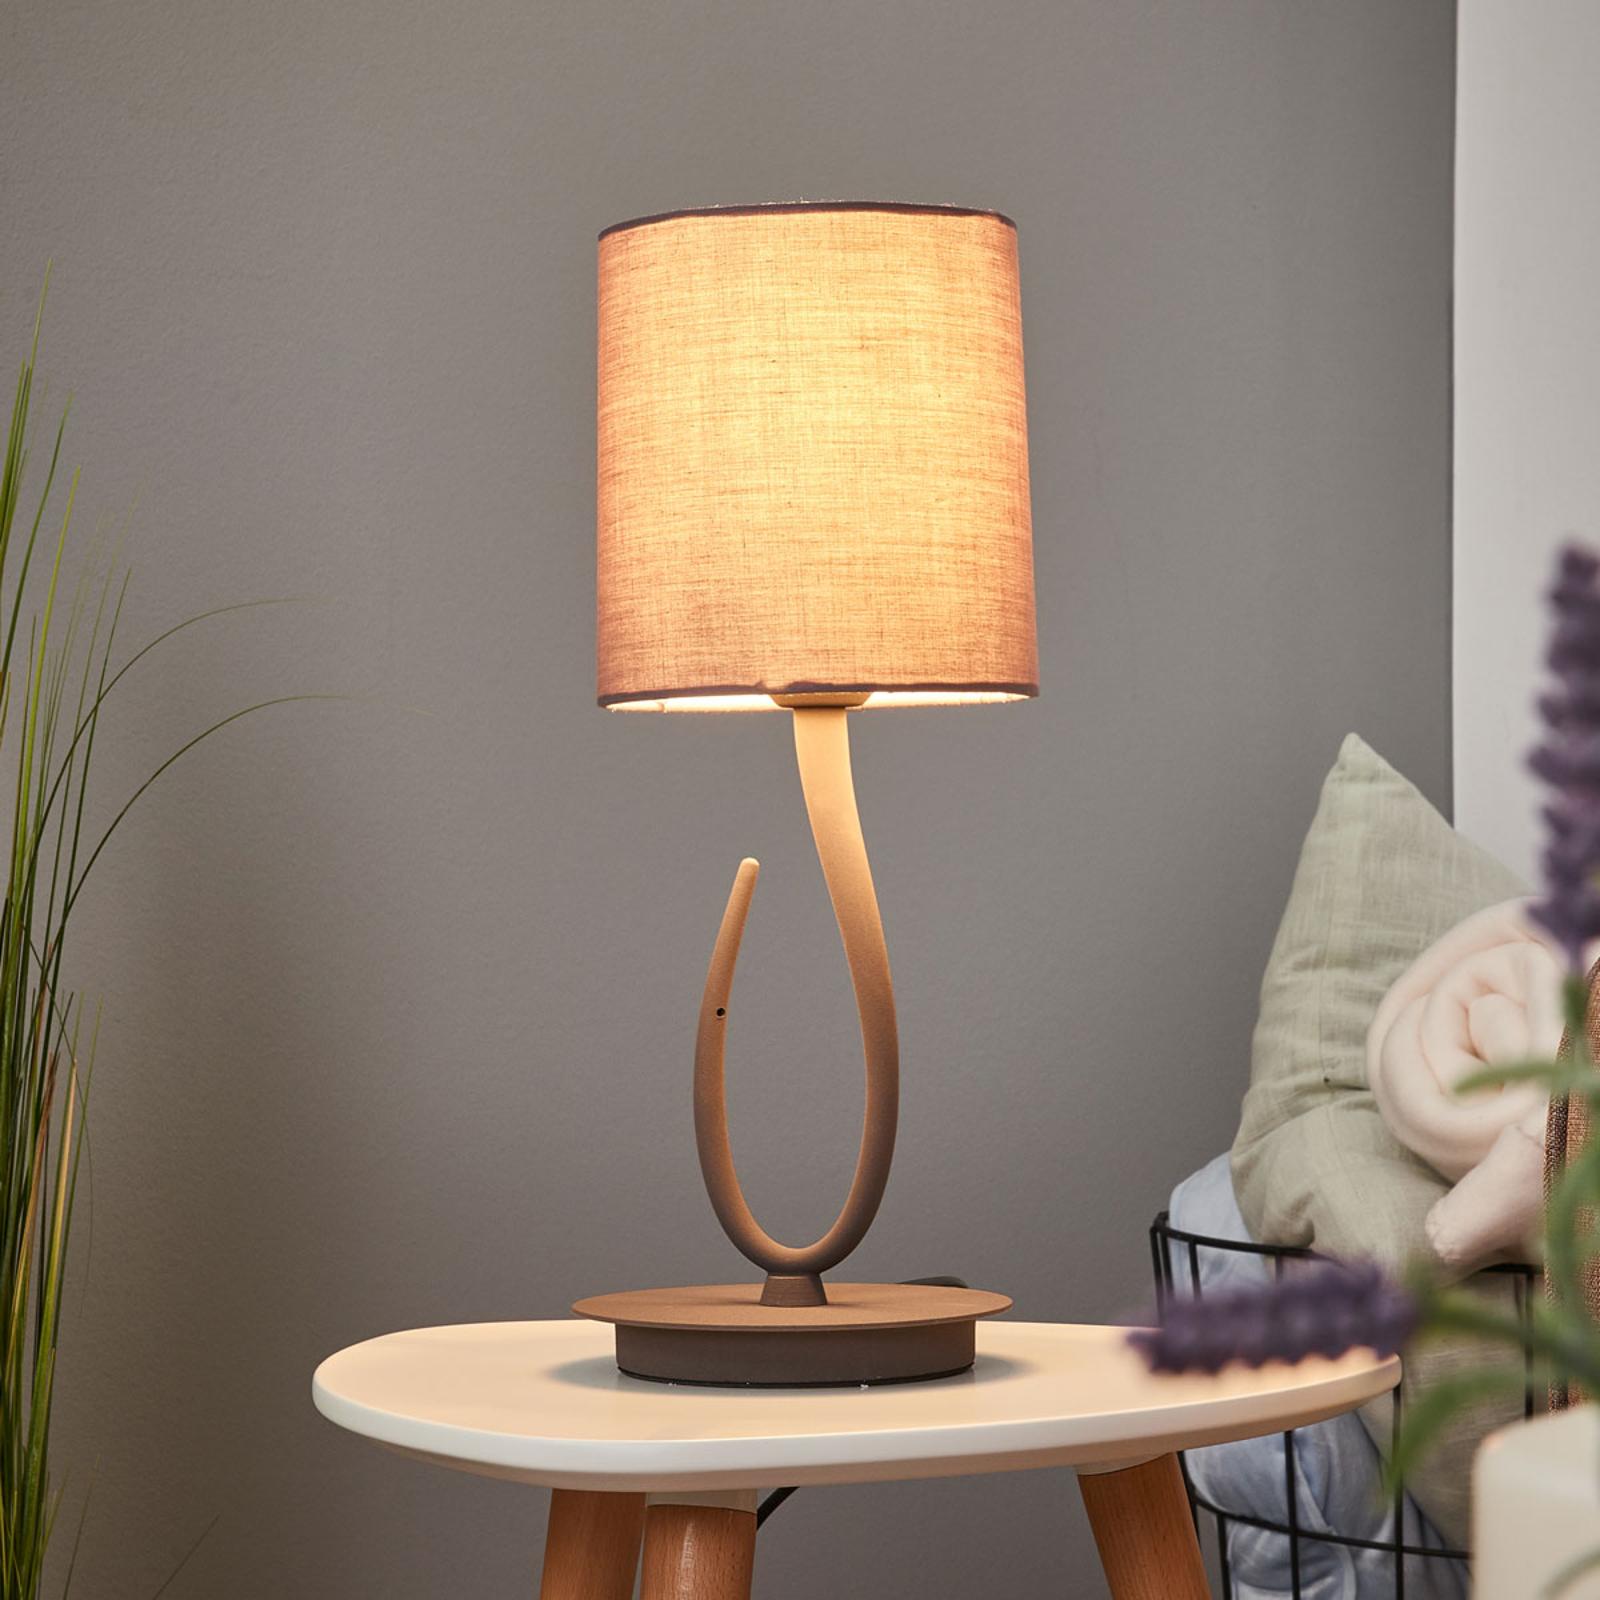 Tafellamp Lua met textiele kap, 16 cm